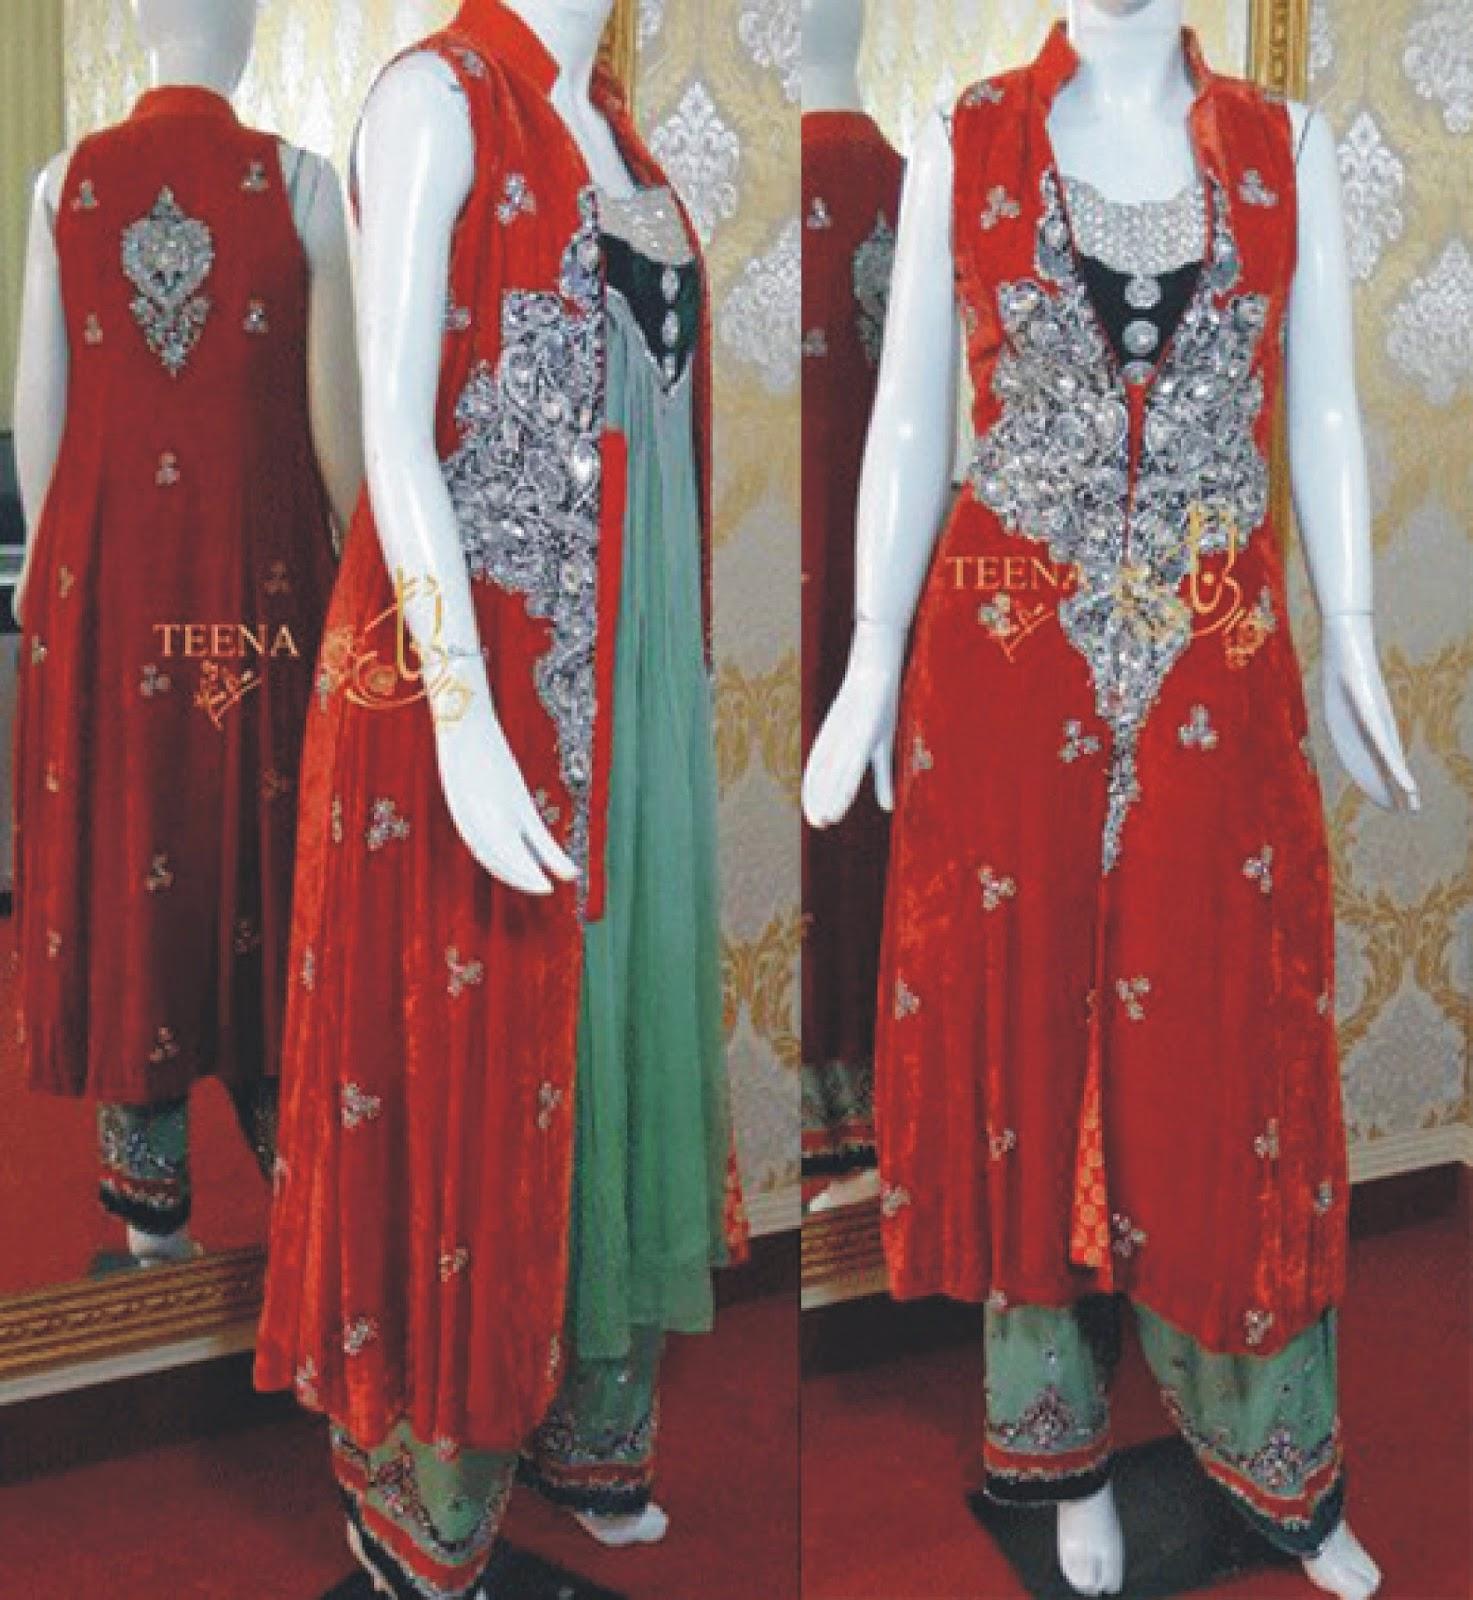 Double shirt dress design - Pakistani Double Shirt Open Style Dress Design